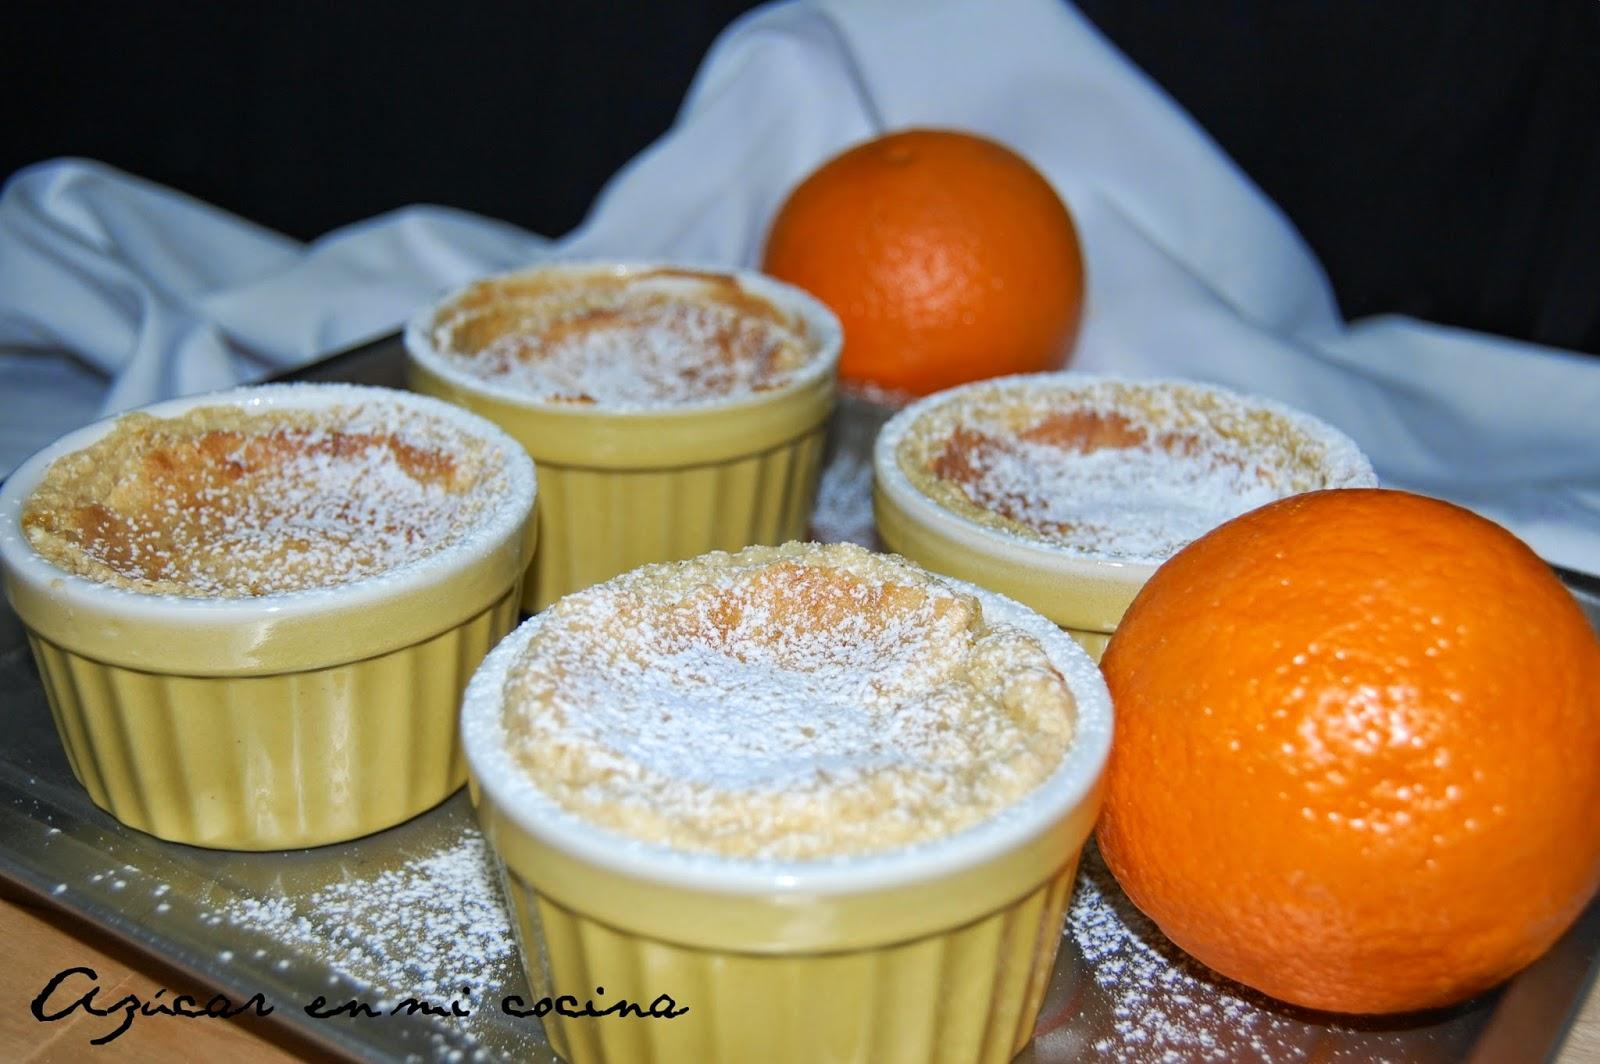 http://azucarenmicocina.blogspot.com.es/2014/06/souffle-de-zumo-y-mermelada-de-naranja.html